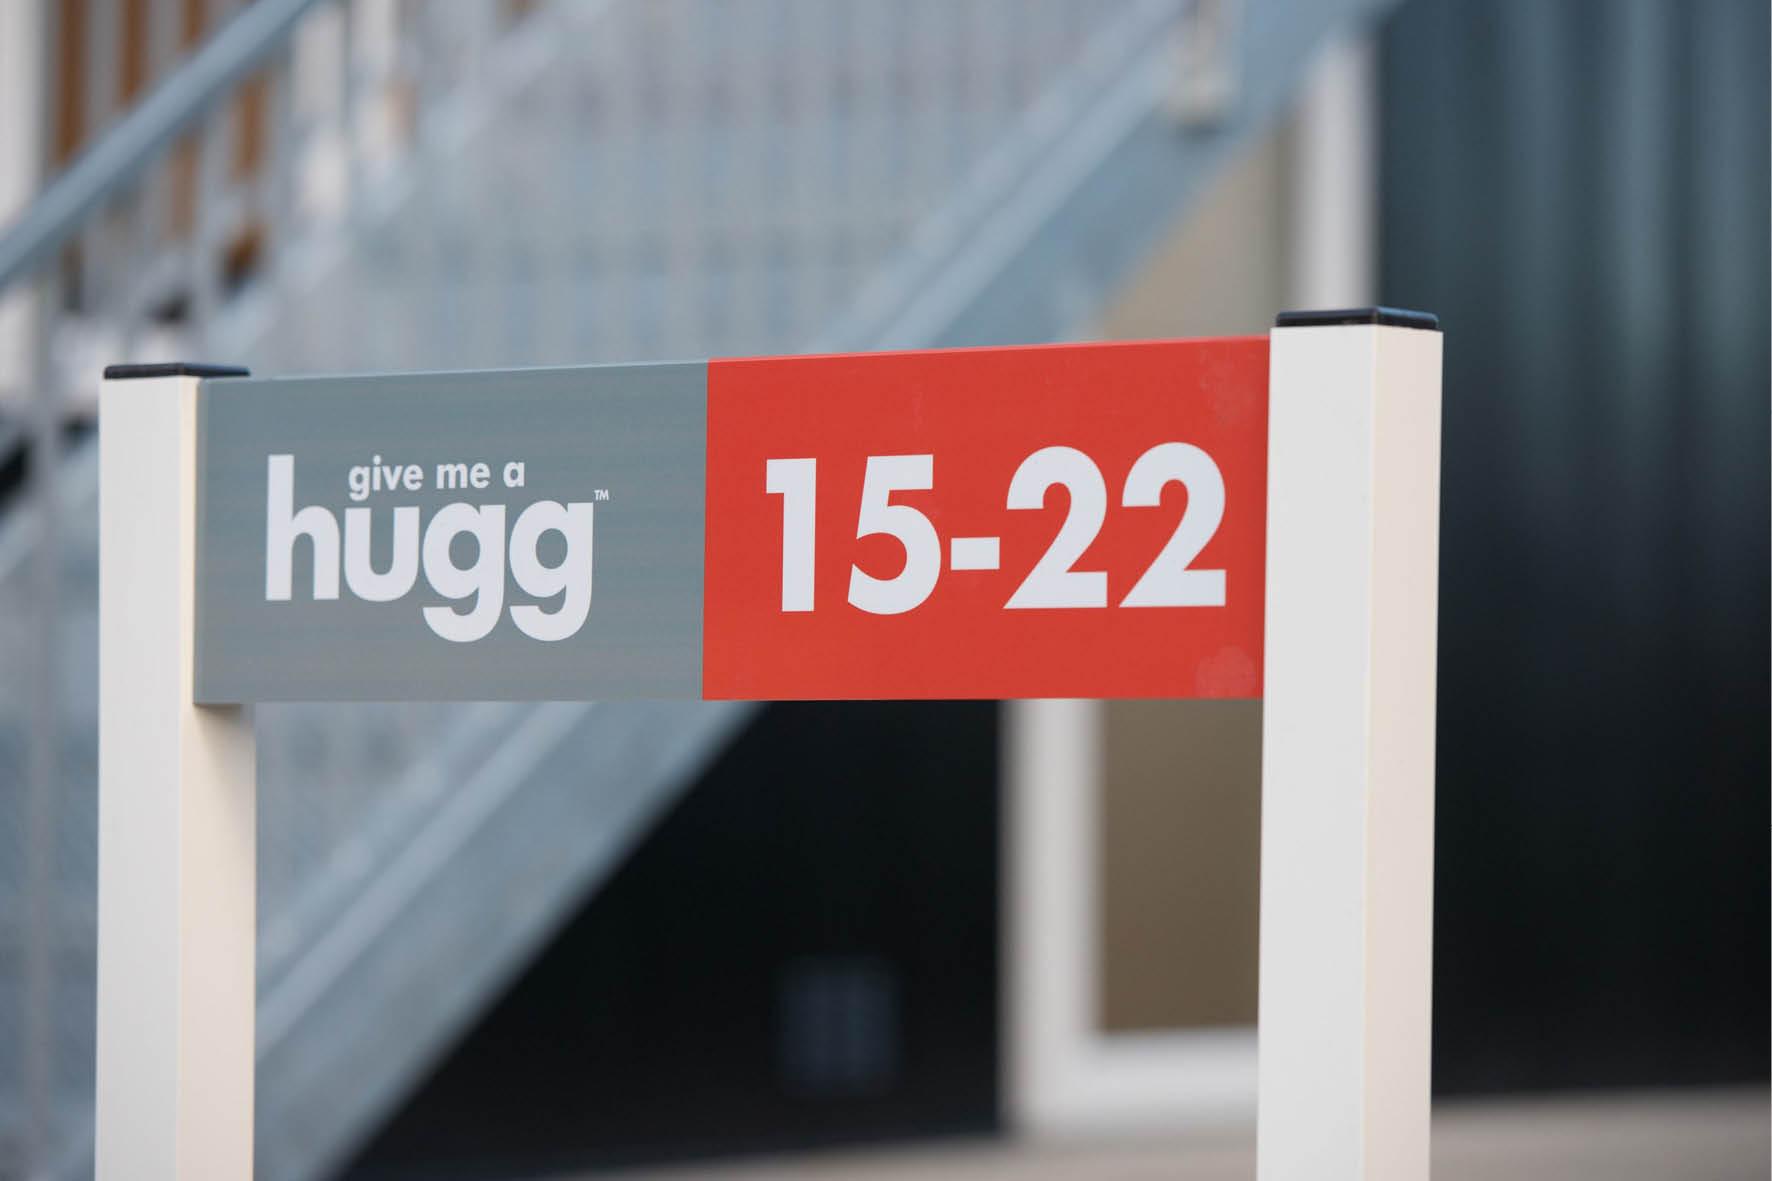 hugg_2019_2.jpg